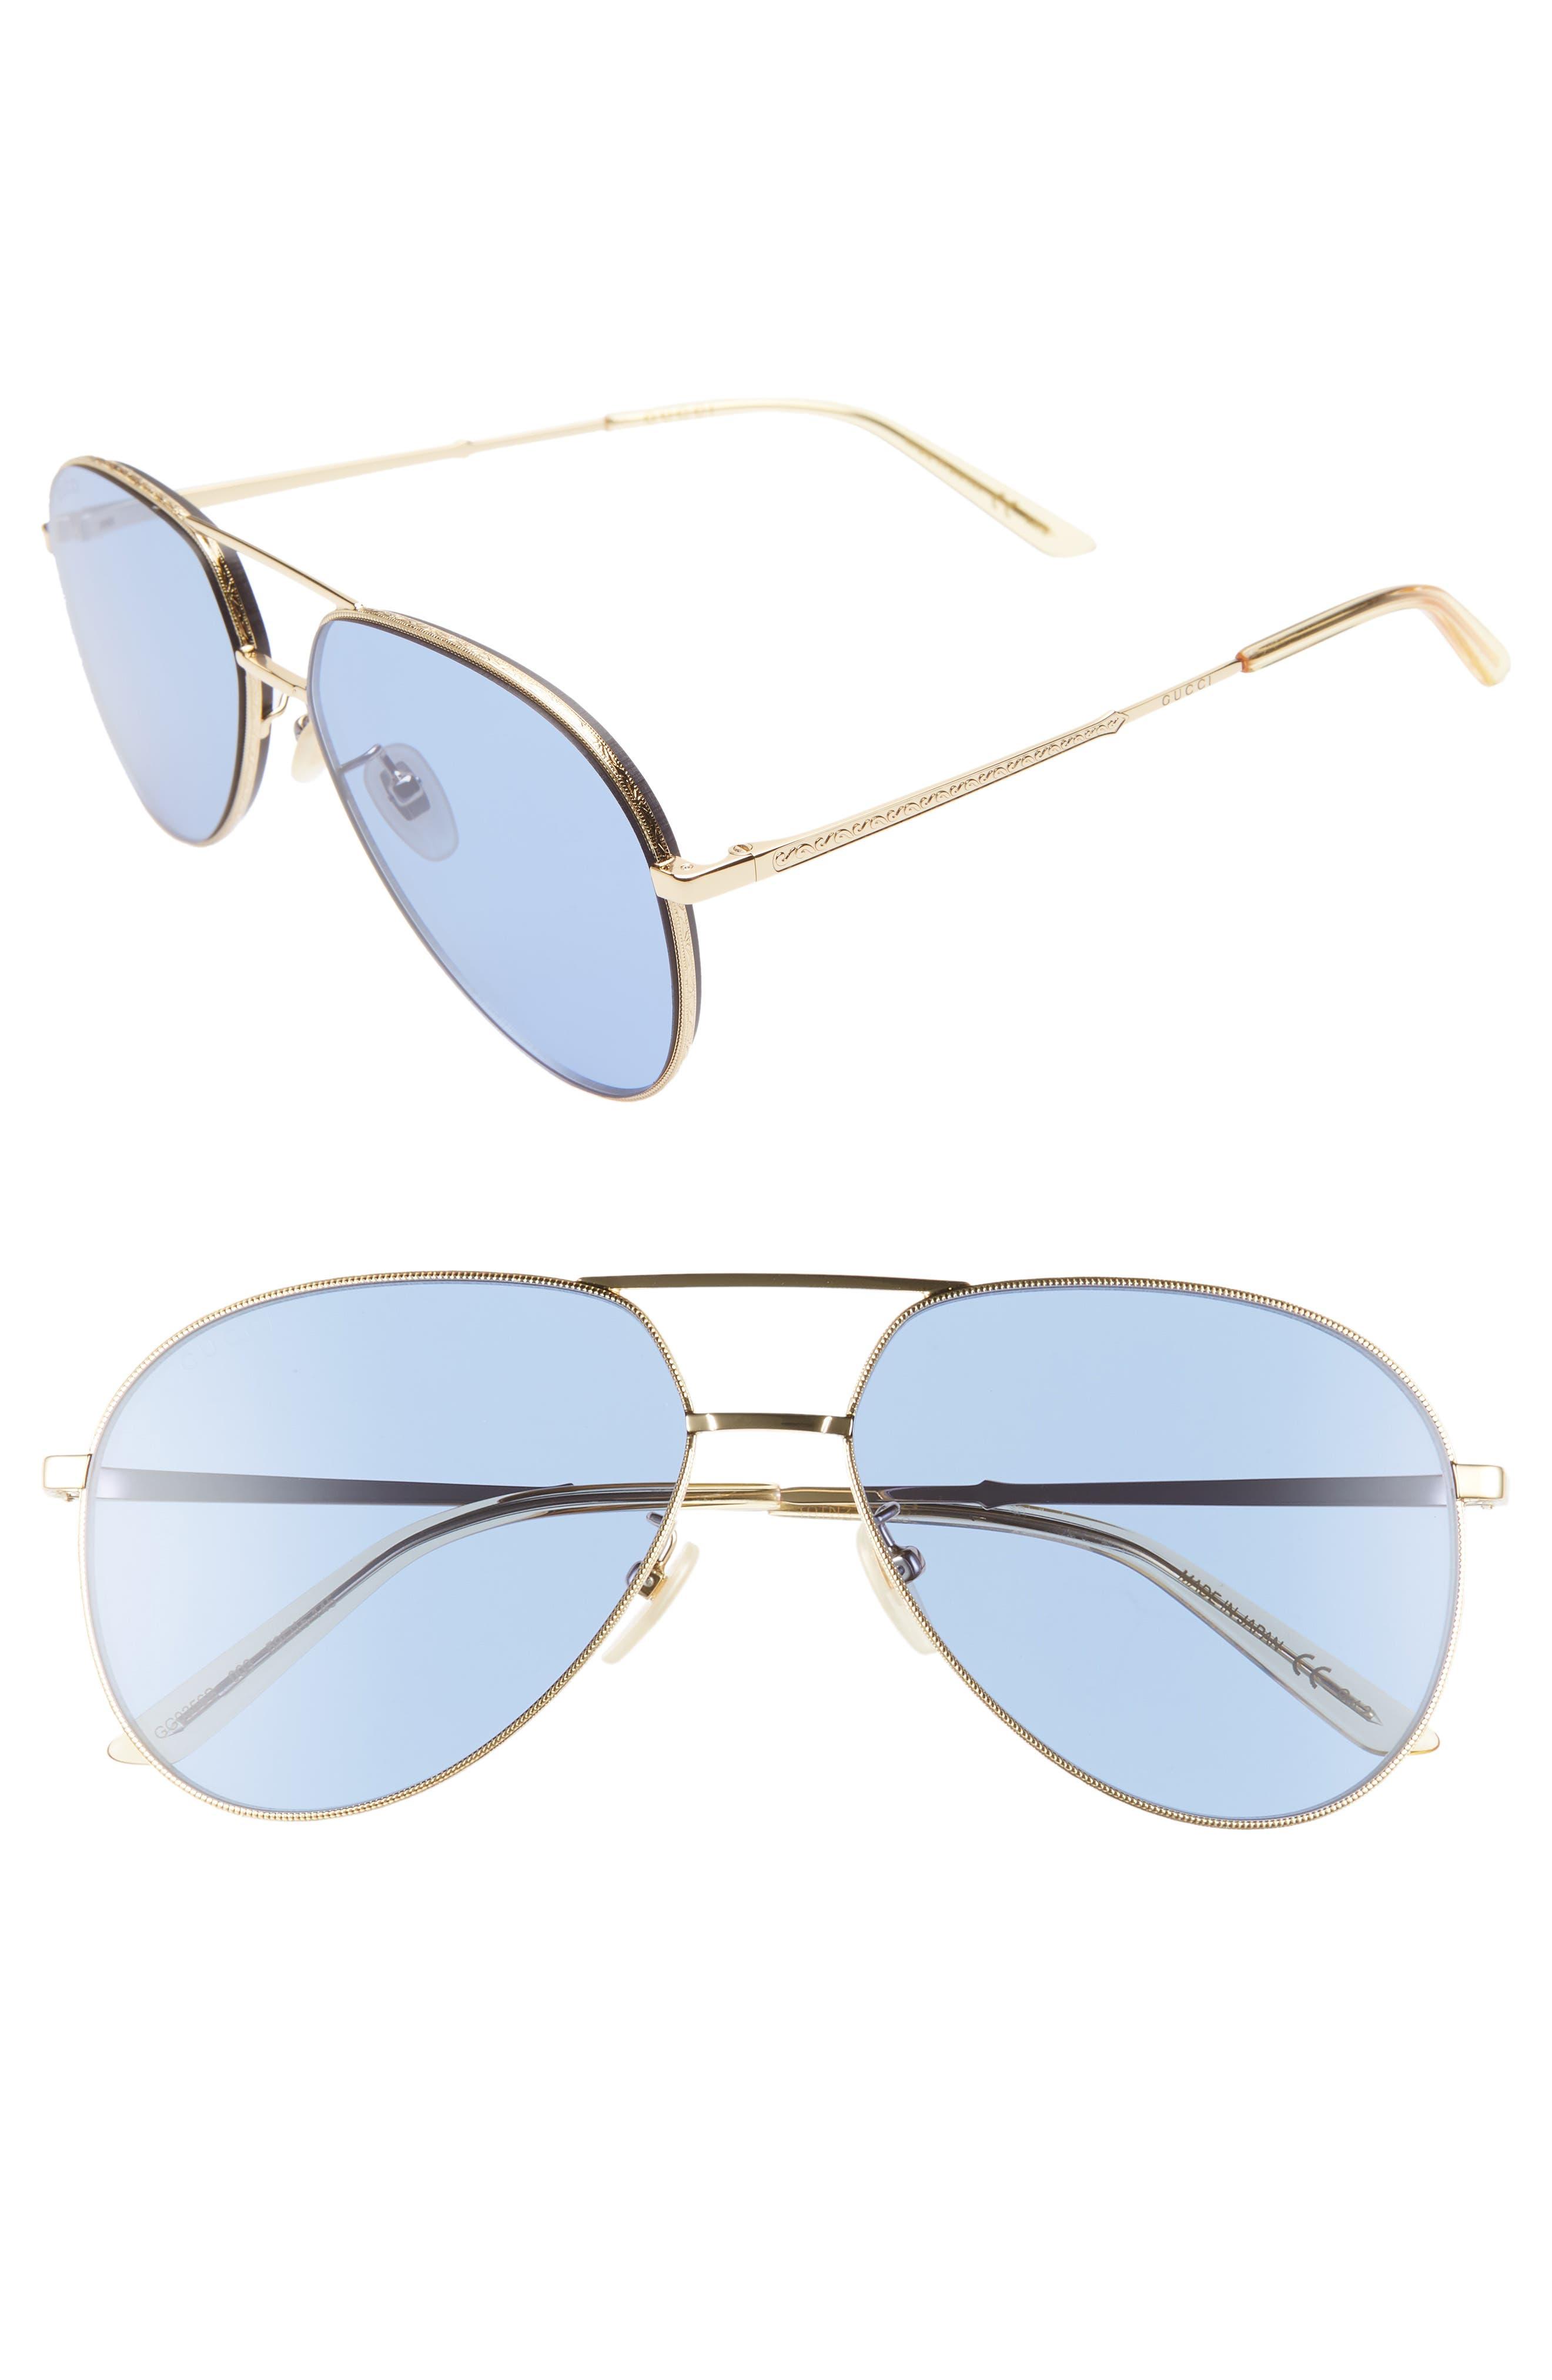 59mm Metal Aviator Sunglasses,                             Main thumbnail 1, color,                             712